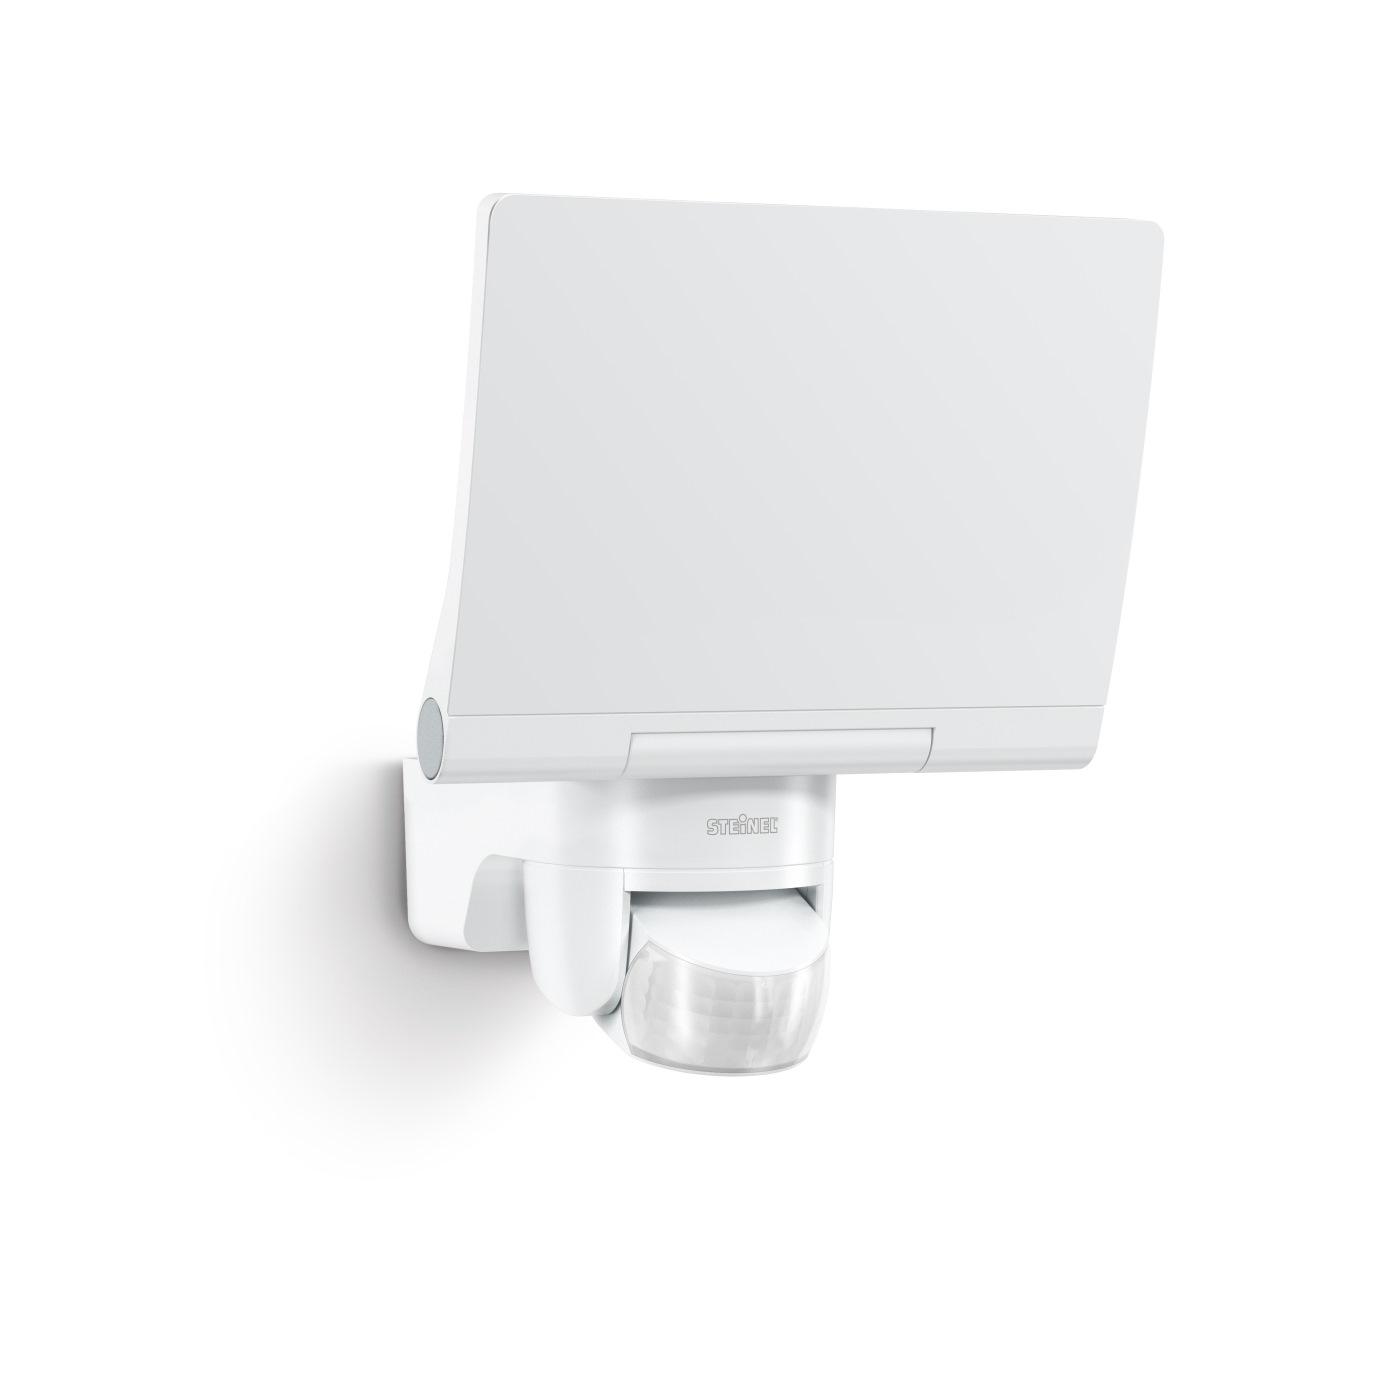 steinel sensor xled home 2 xl floodlight with 20w 1608im indoor outdoor lighting horme. Black Bedroom Furniture Sets. Home Design Ideas